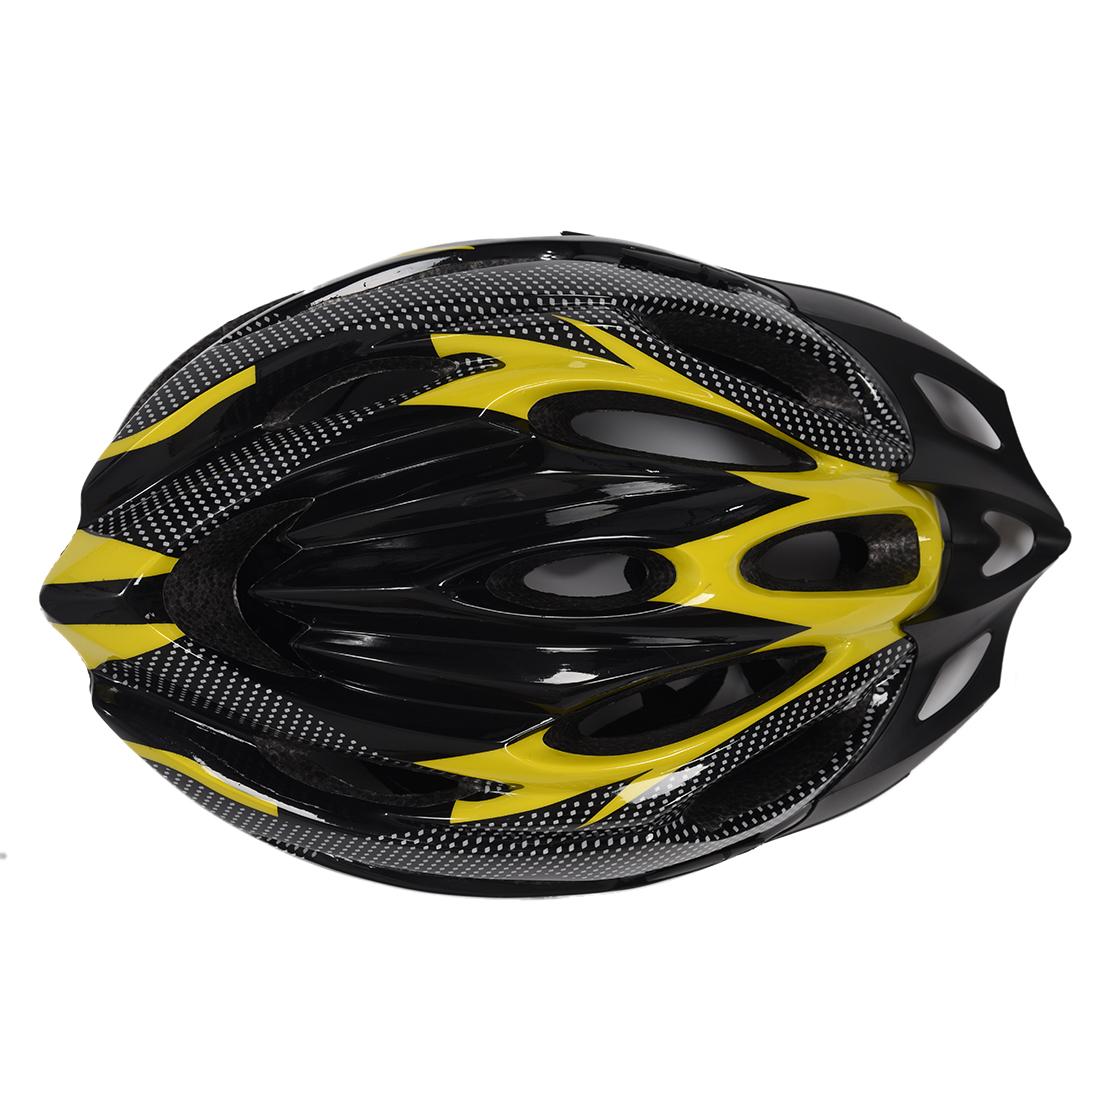 Esz Fashion Sports Bike Bicycle Cycling Safety Helmet With